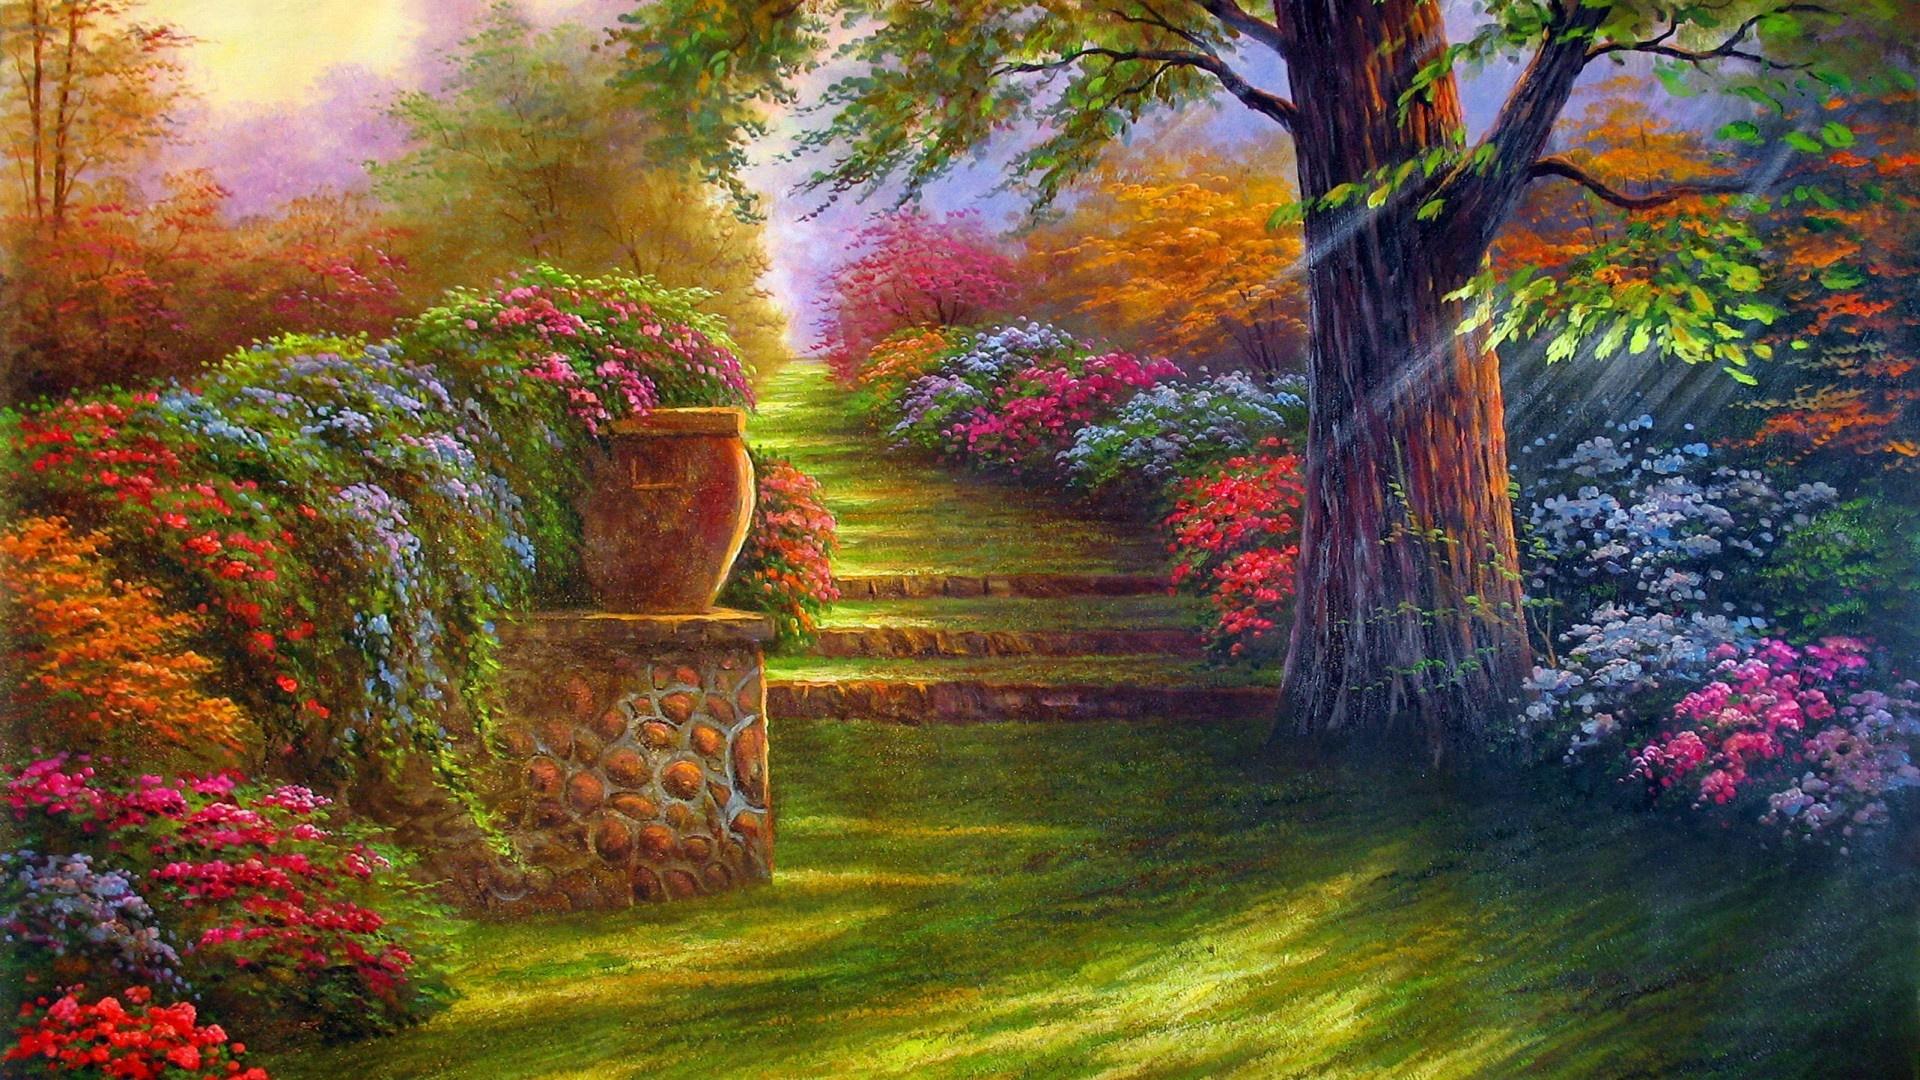 Flower Garden Wallpapers 1920x1080